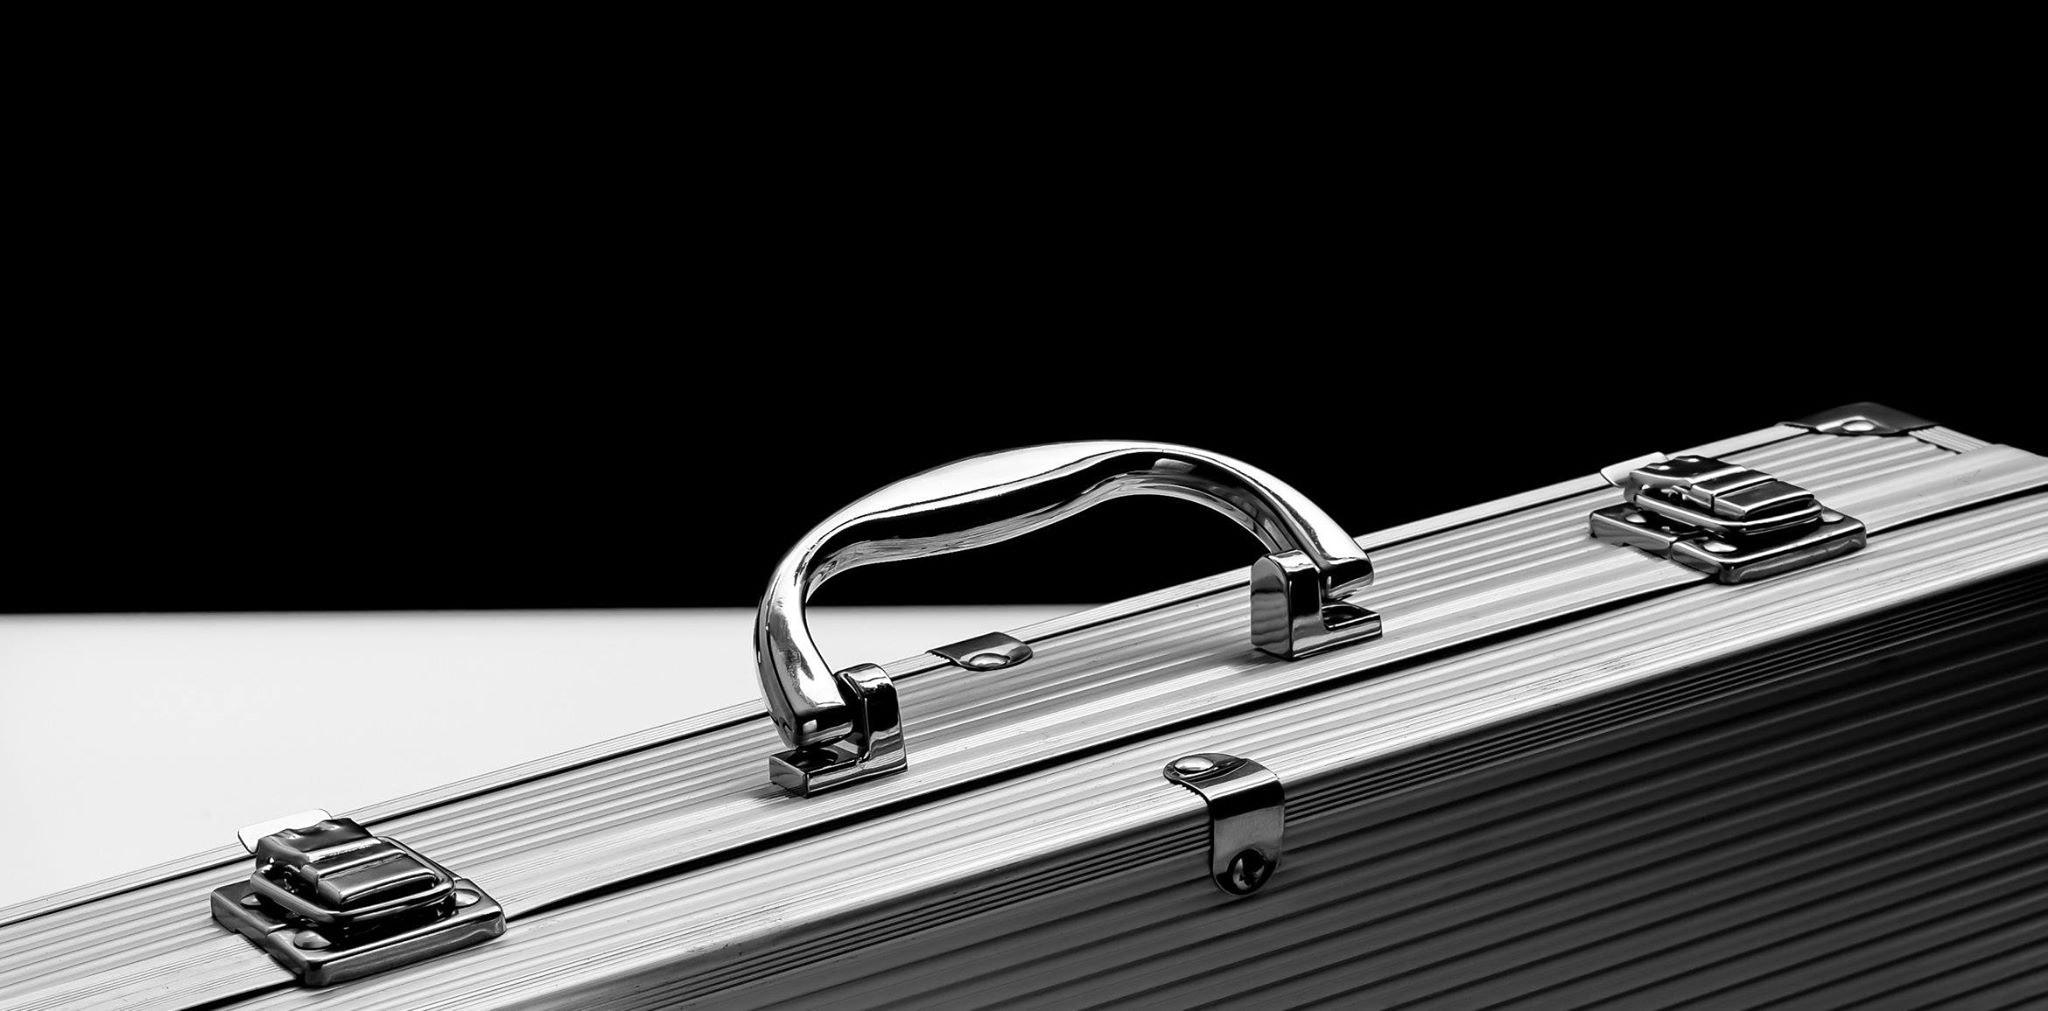 Silver Suit Case, Aluminum, Black-and-white, Briefcase, Business, HQ Photo